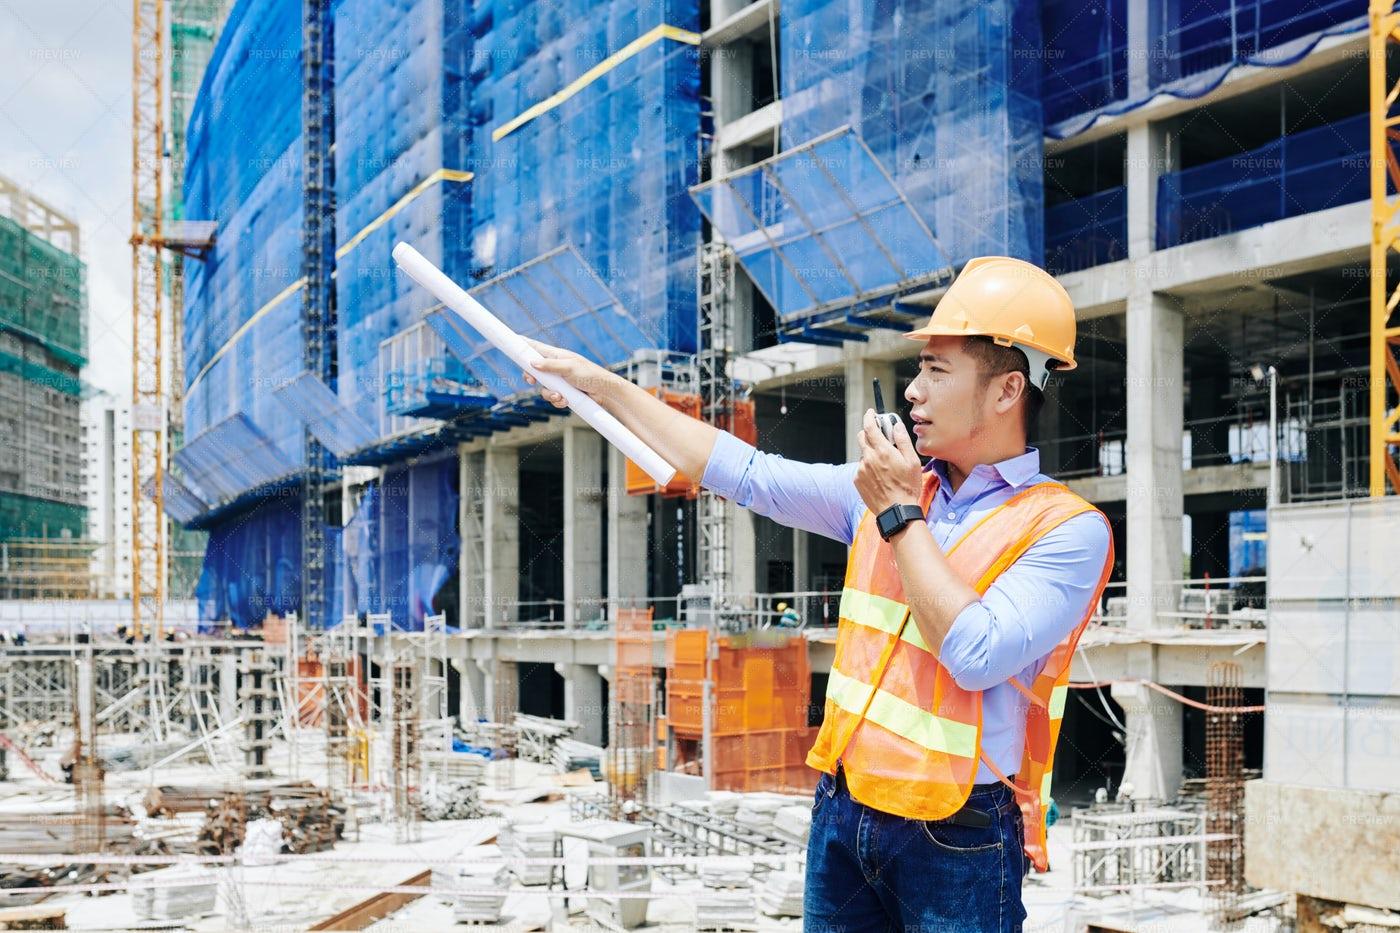 Serious Civil Engineer Managing: Stock Photos